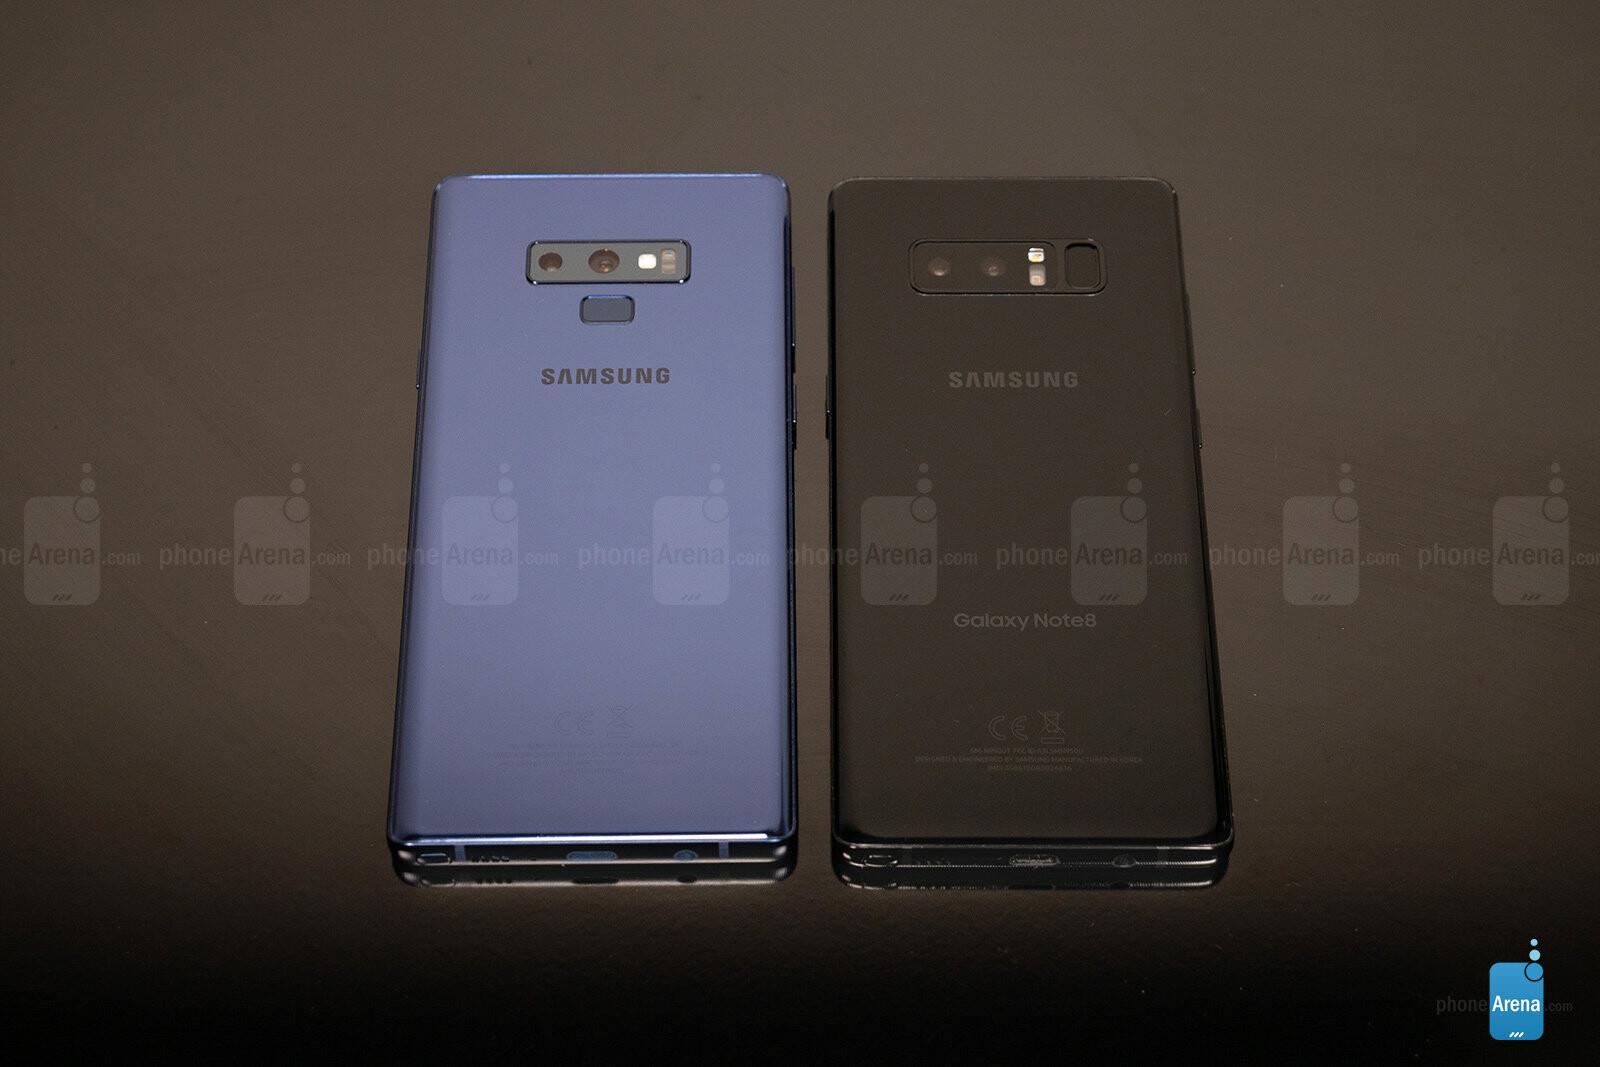 Samsung Galaxy Note 9 vs Galaxy Note 8 - PhoneArena